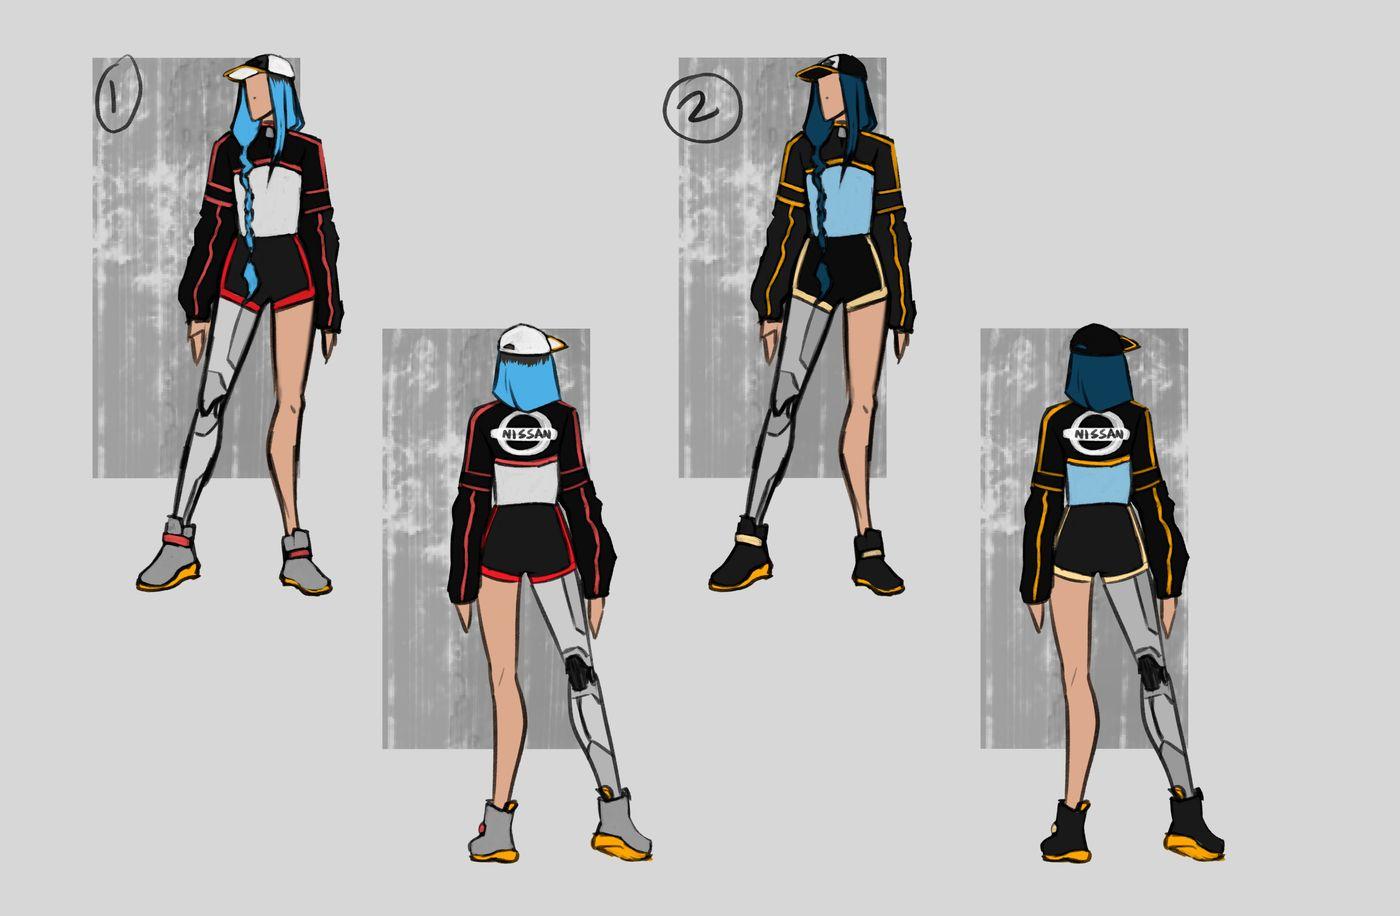 Steer Jasmine %20 Scme3420 Rookies %20 Character Design Colour Passes01 Jasminesteer